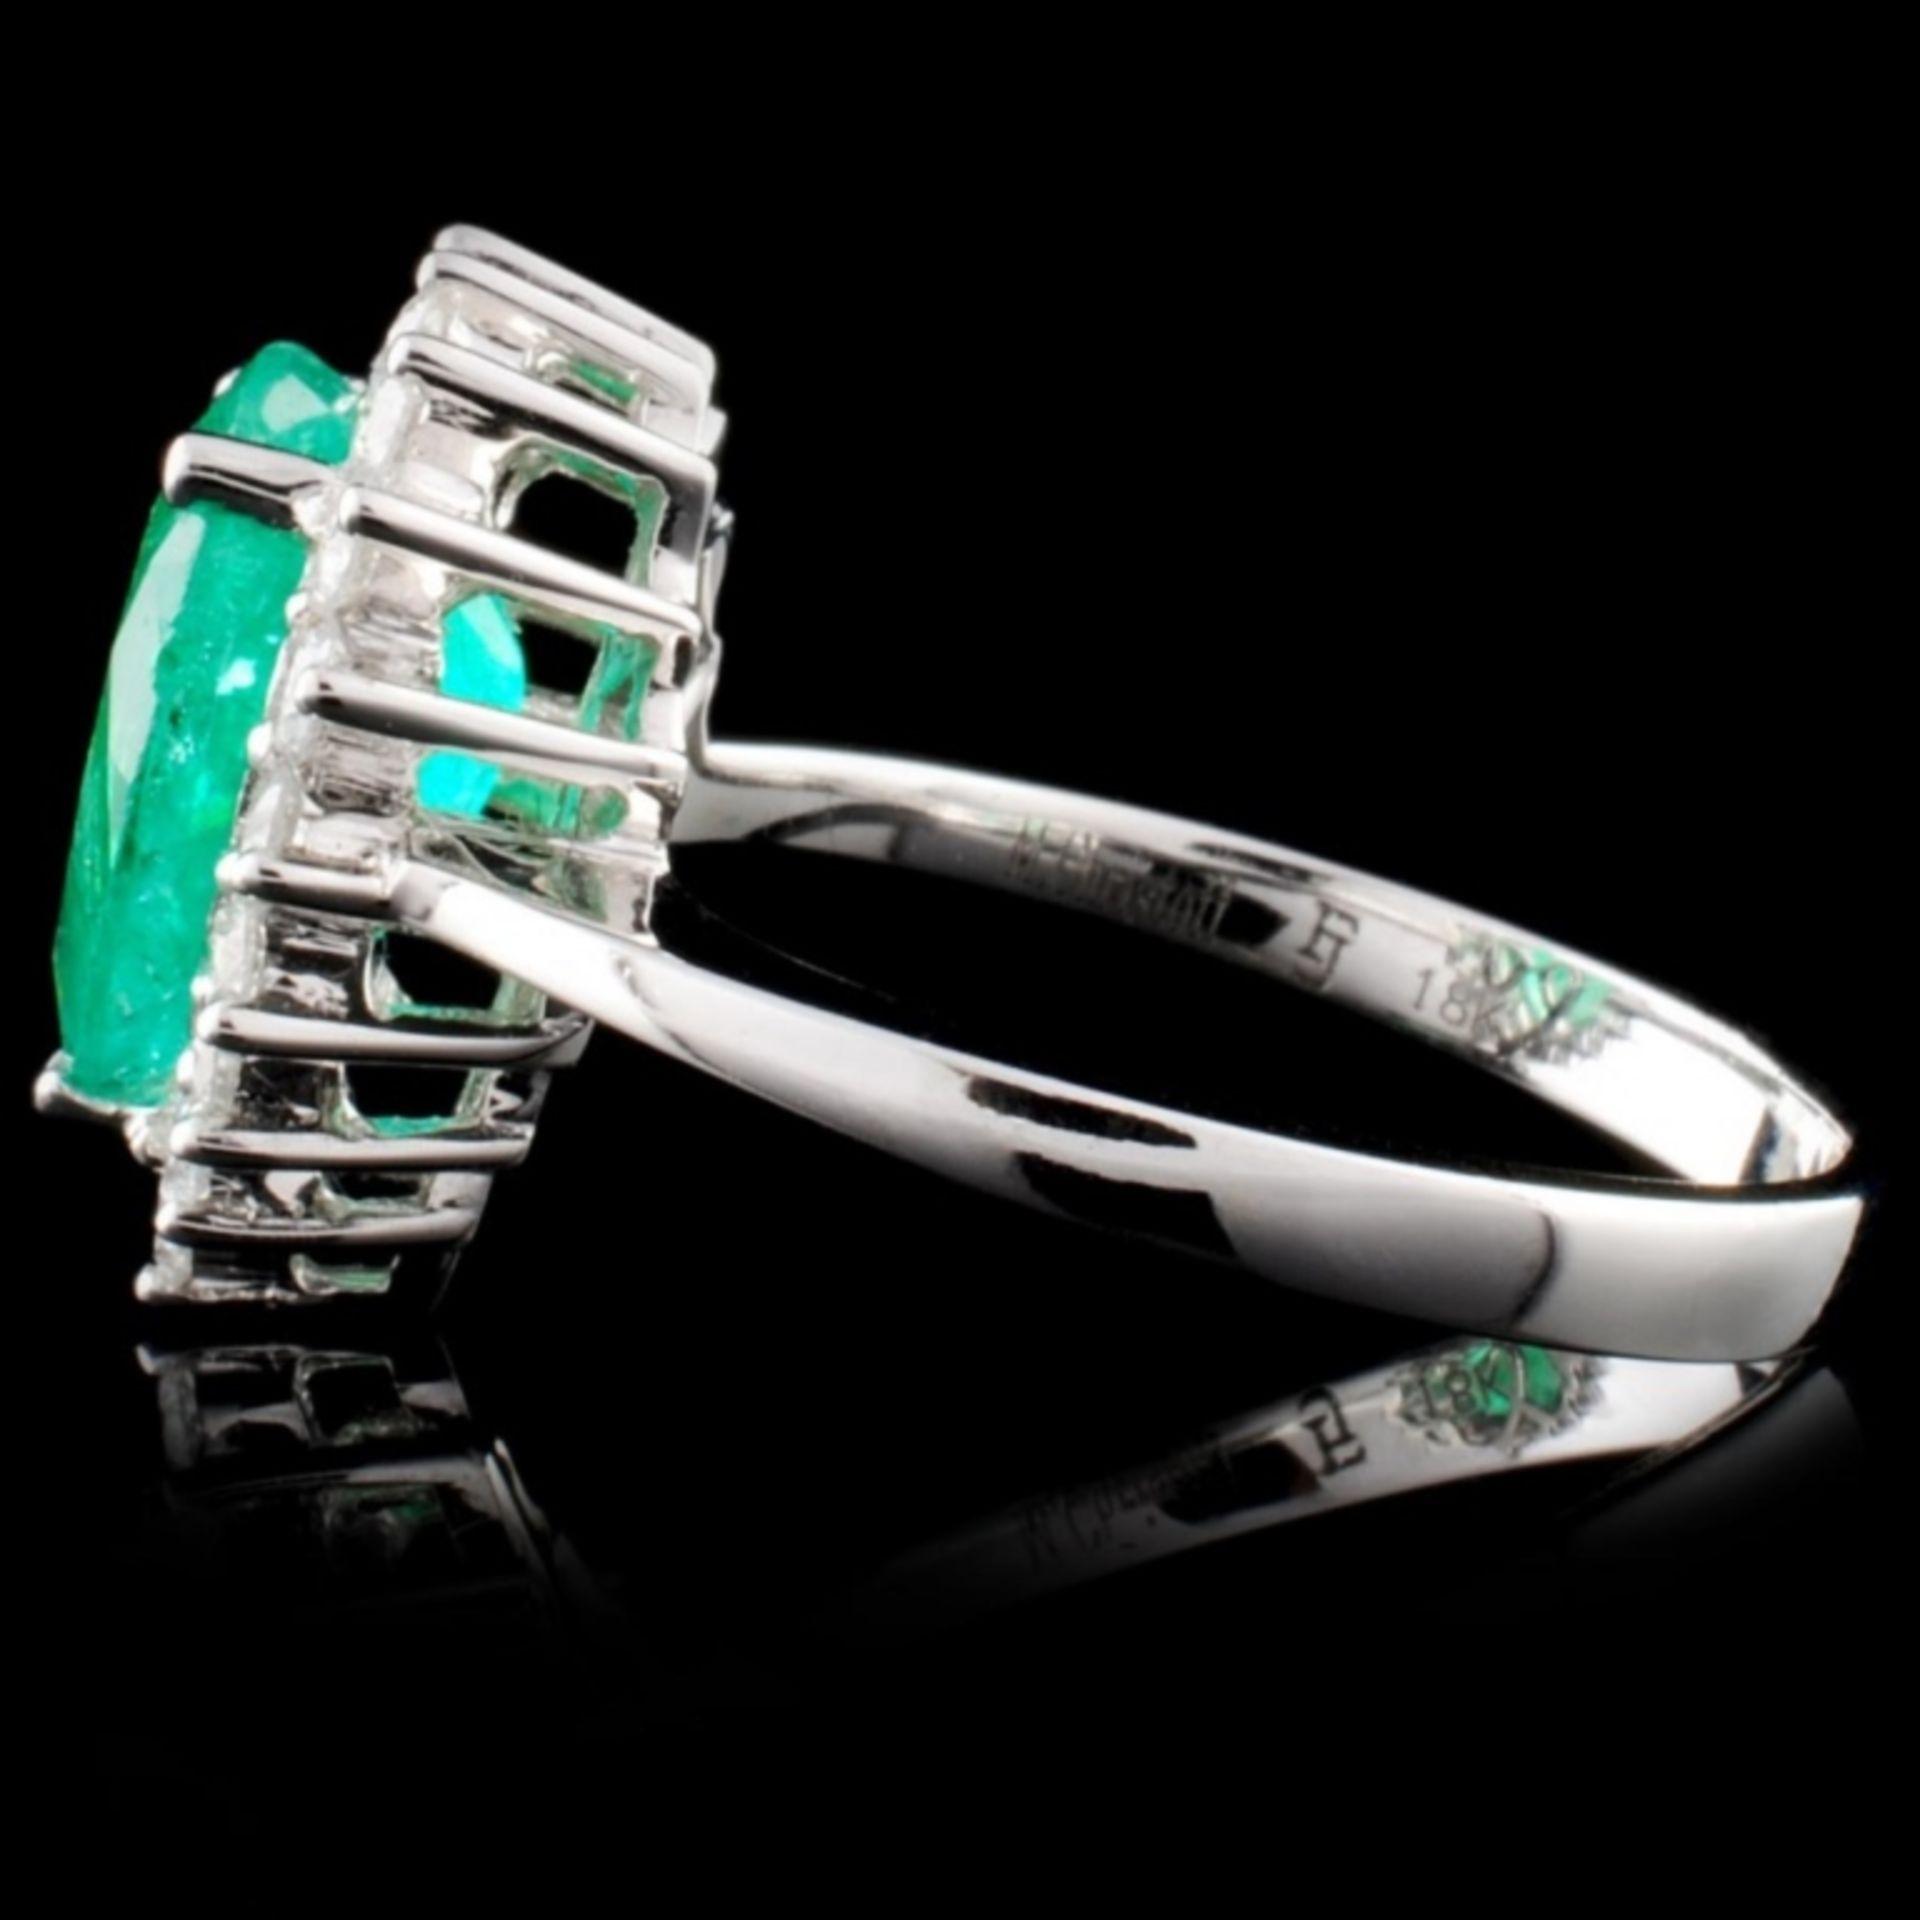 18K White Gold 2.32ct Emerald & 0.56ct Diamond Rin - Image 3 of 4